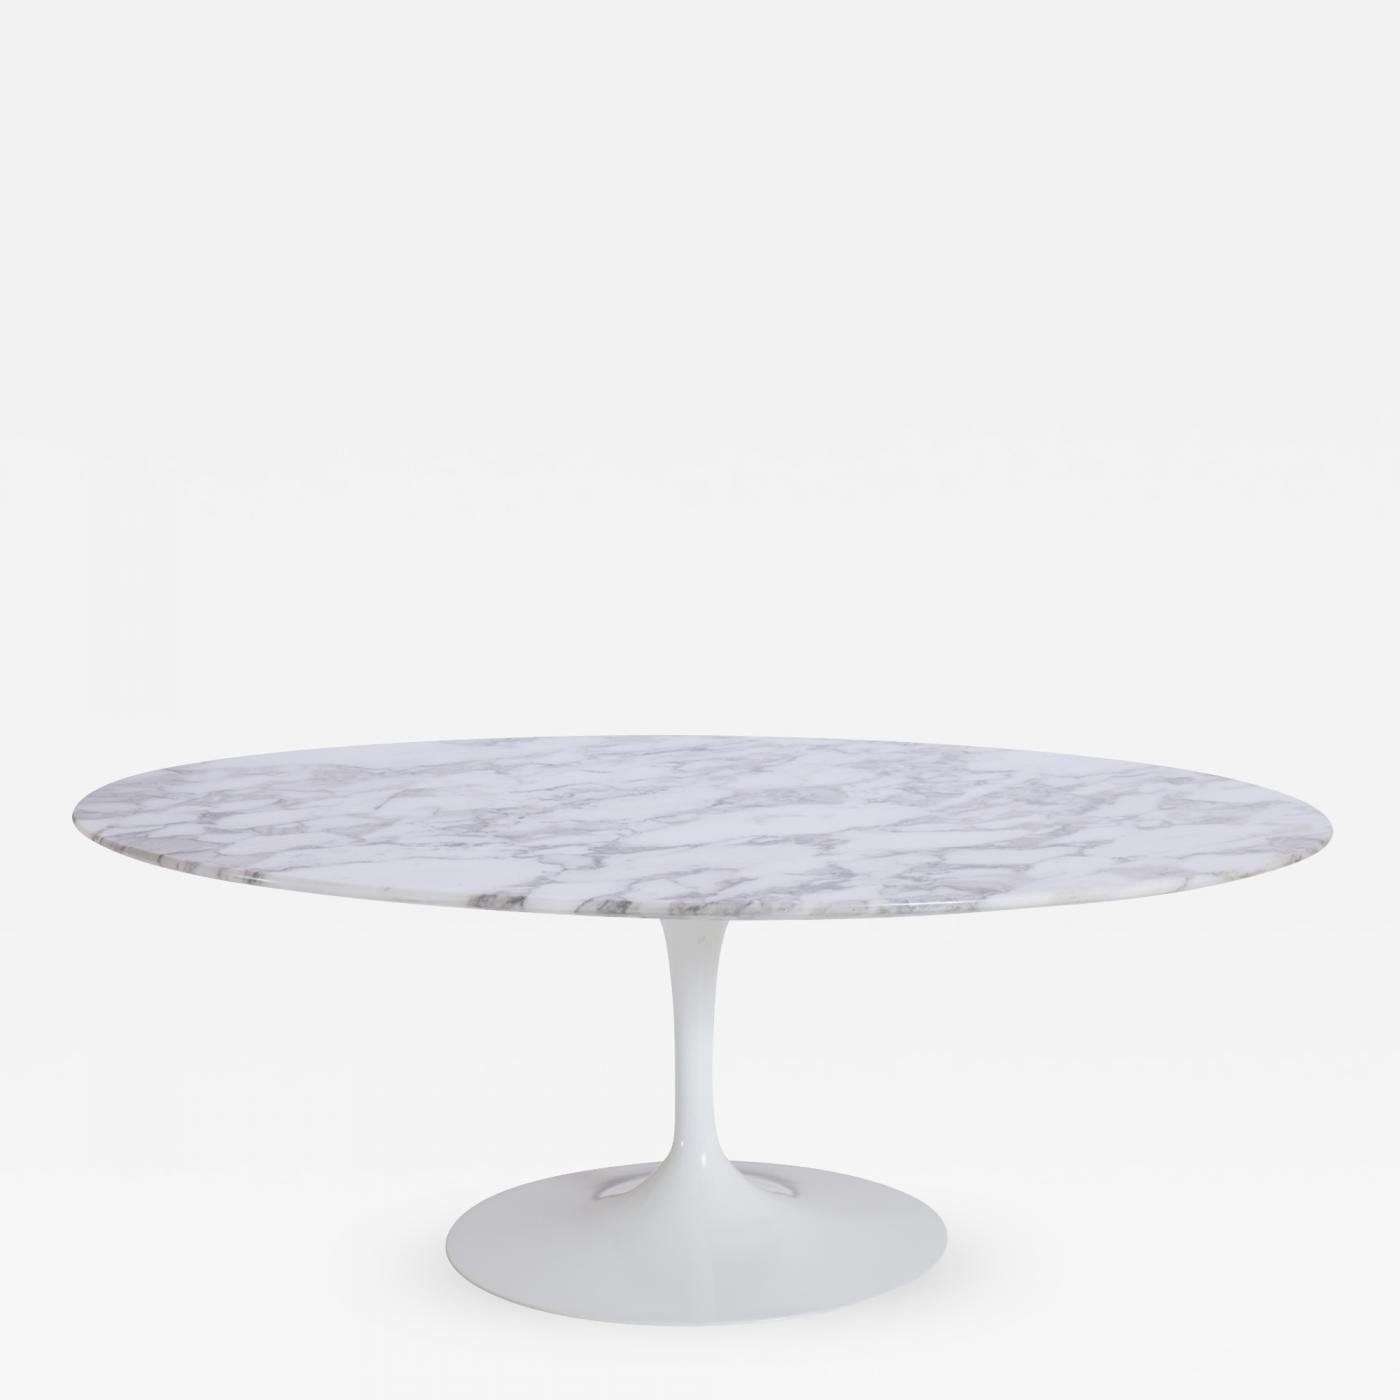 Oval Tulip Coffee Table: Saarinen Oval Tulip Coffee Table In